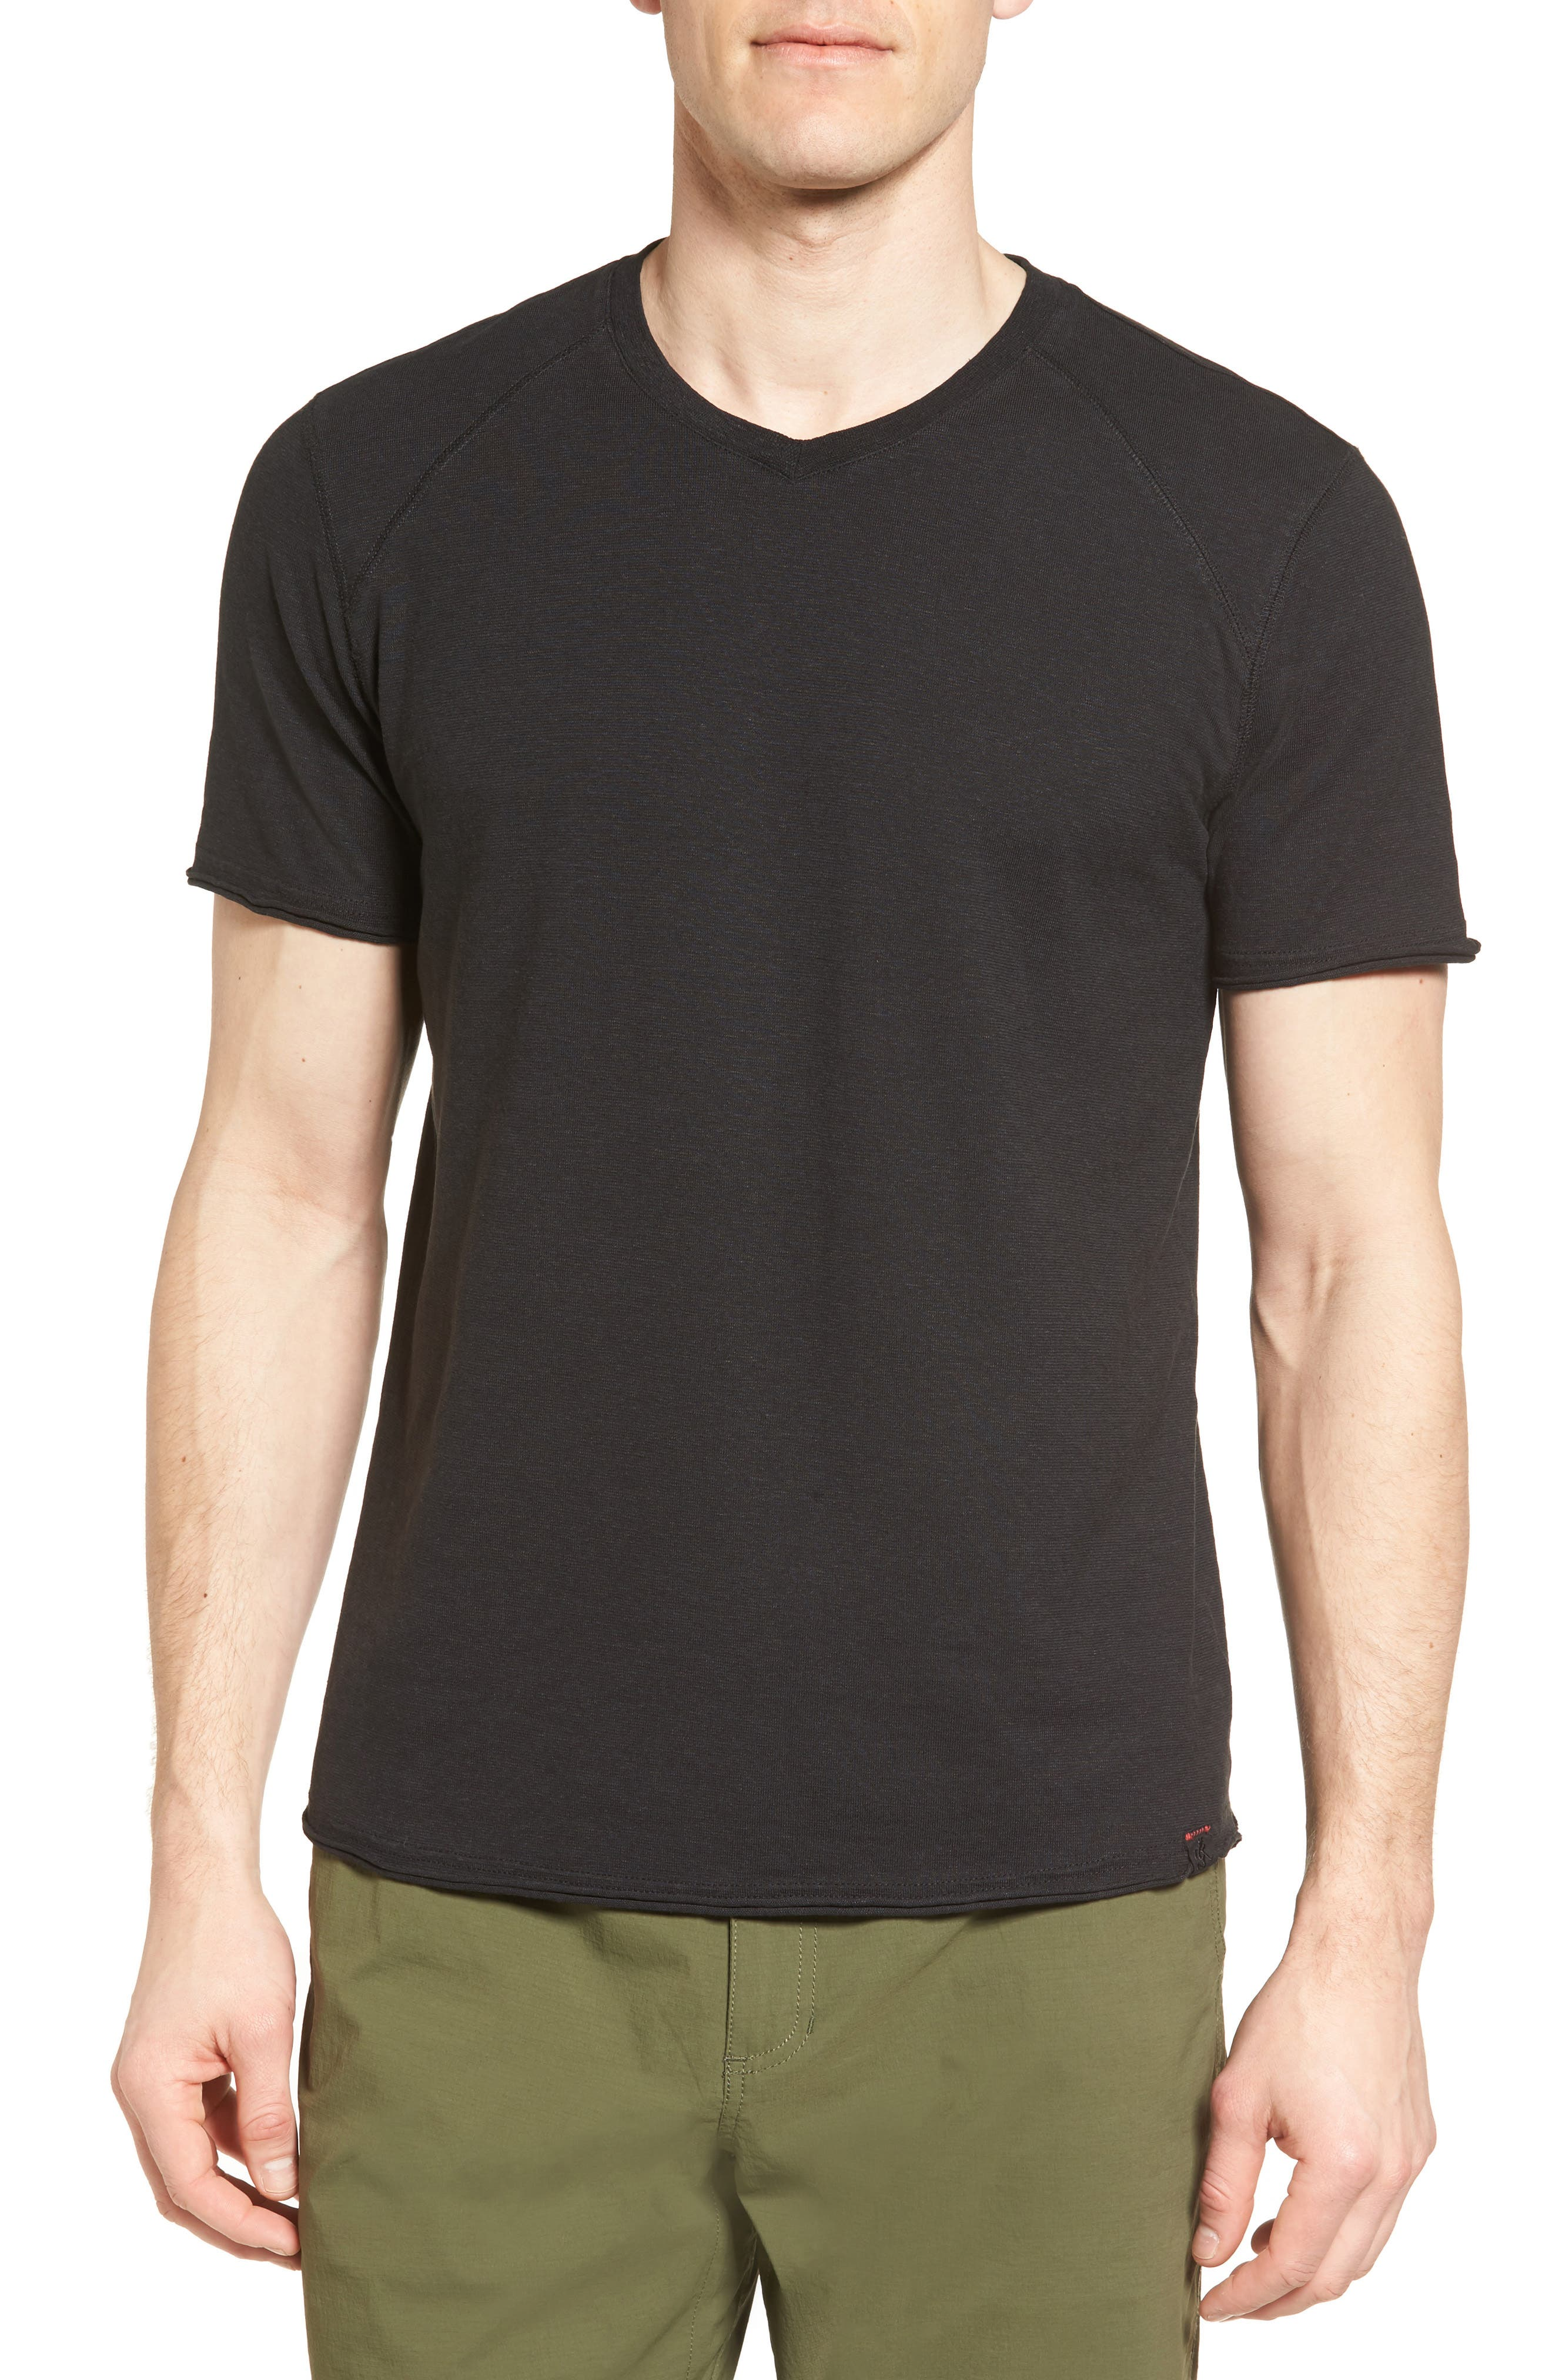 Camura T-Shirt,                             Main thumbnail 1, color,                             002